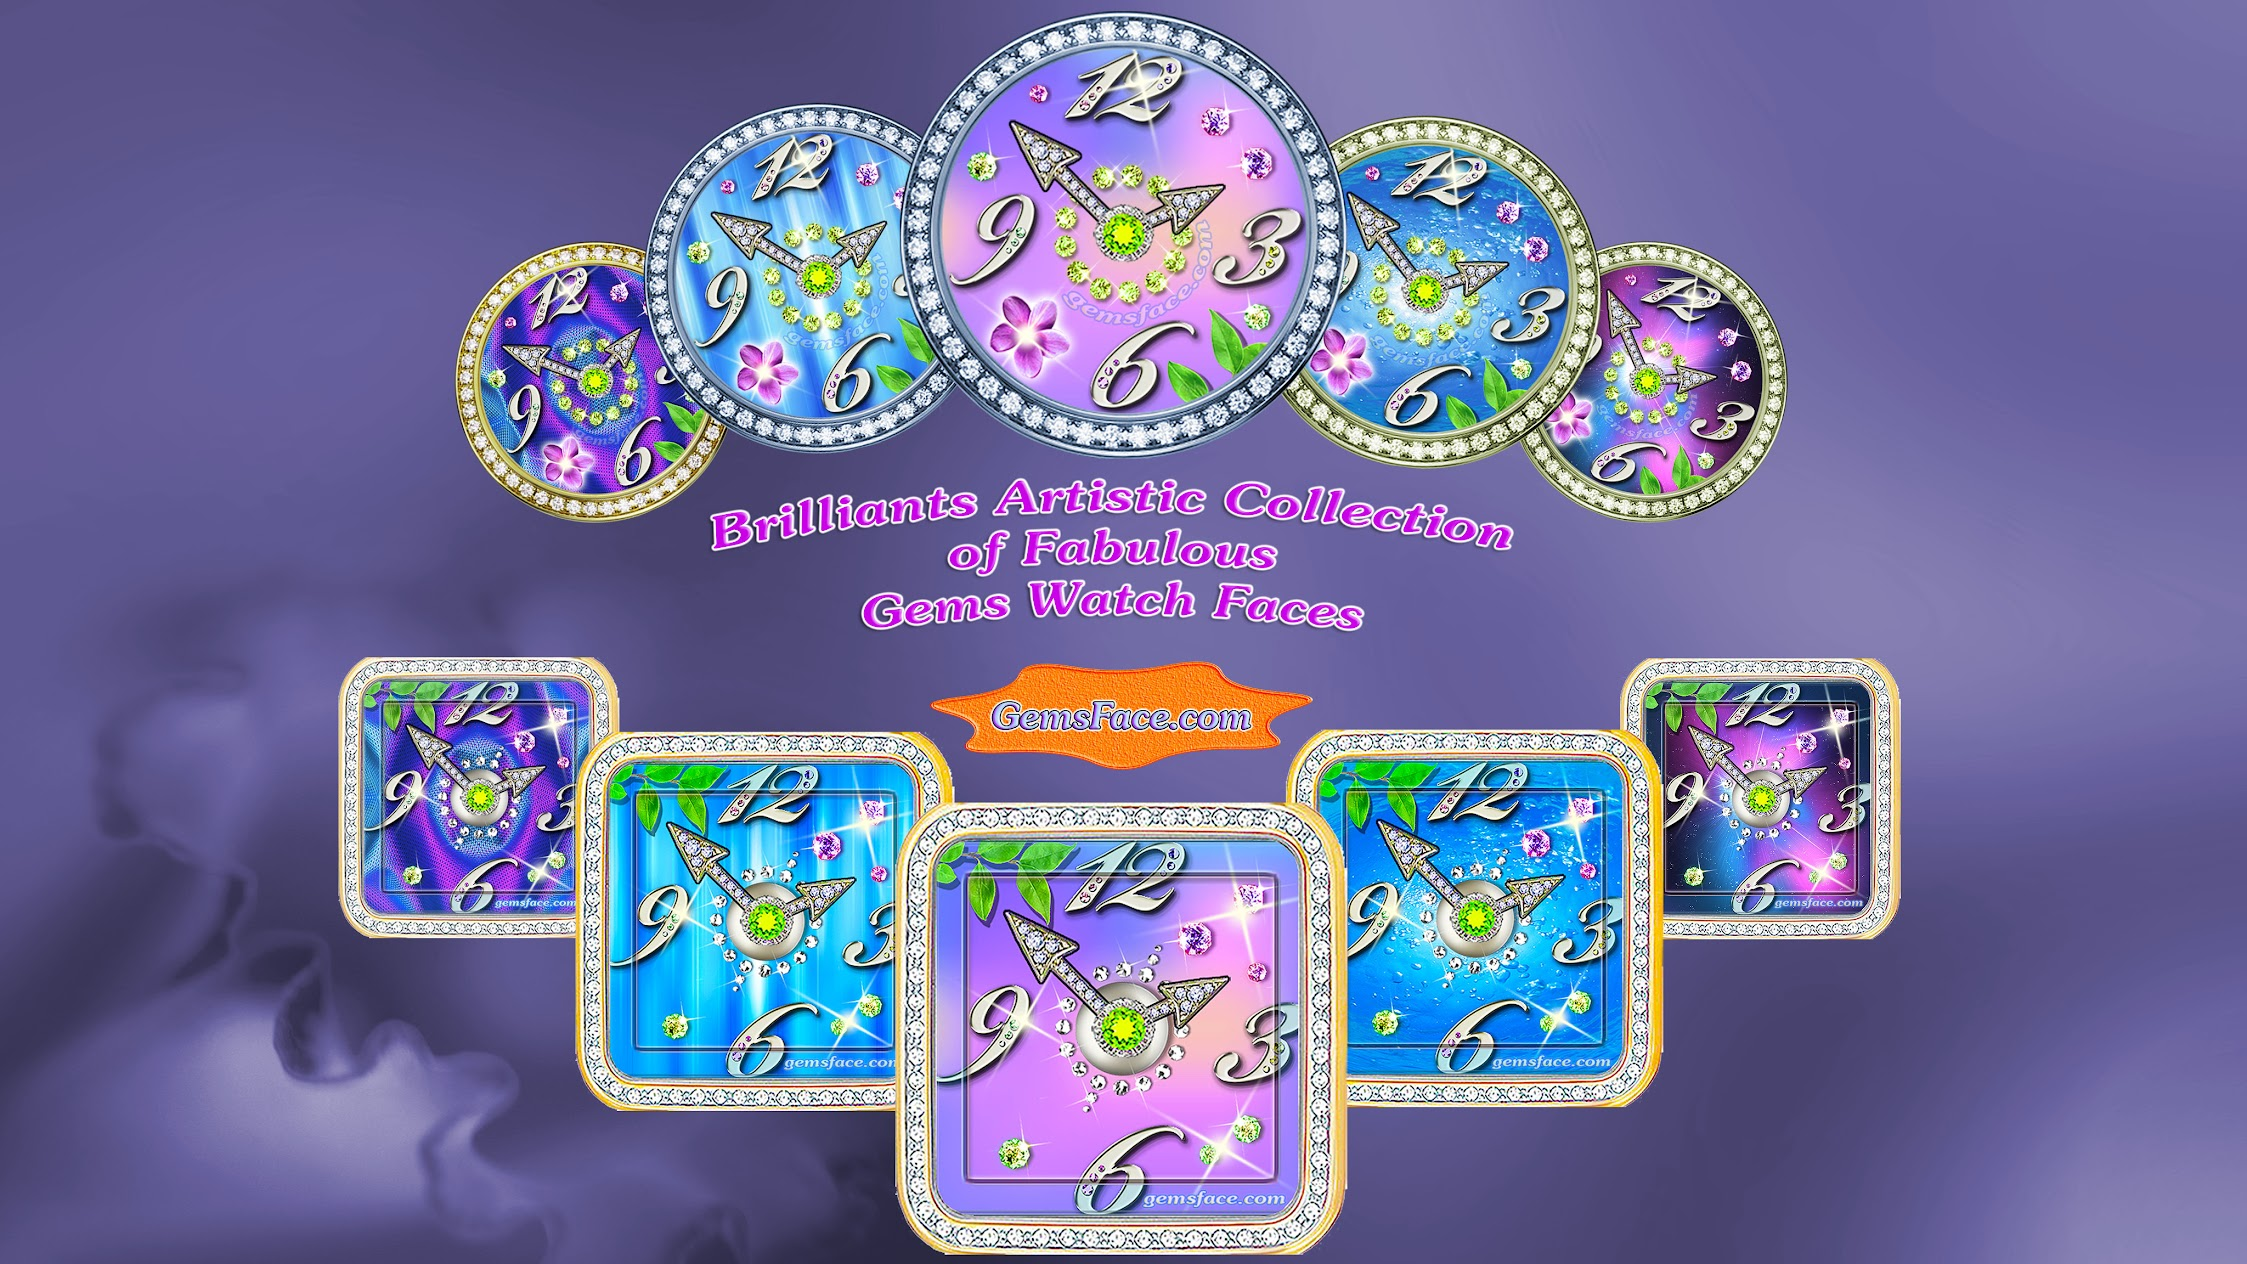 GemsFace.com (Gems Watch Faces)